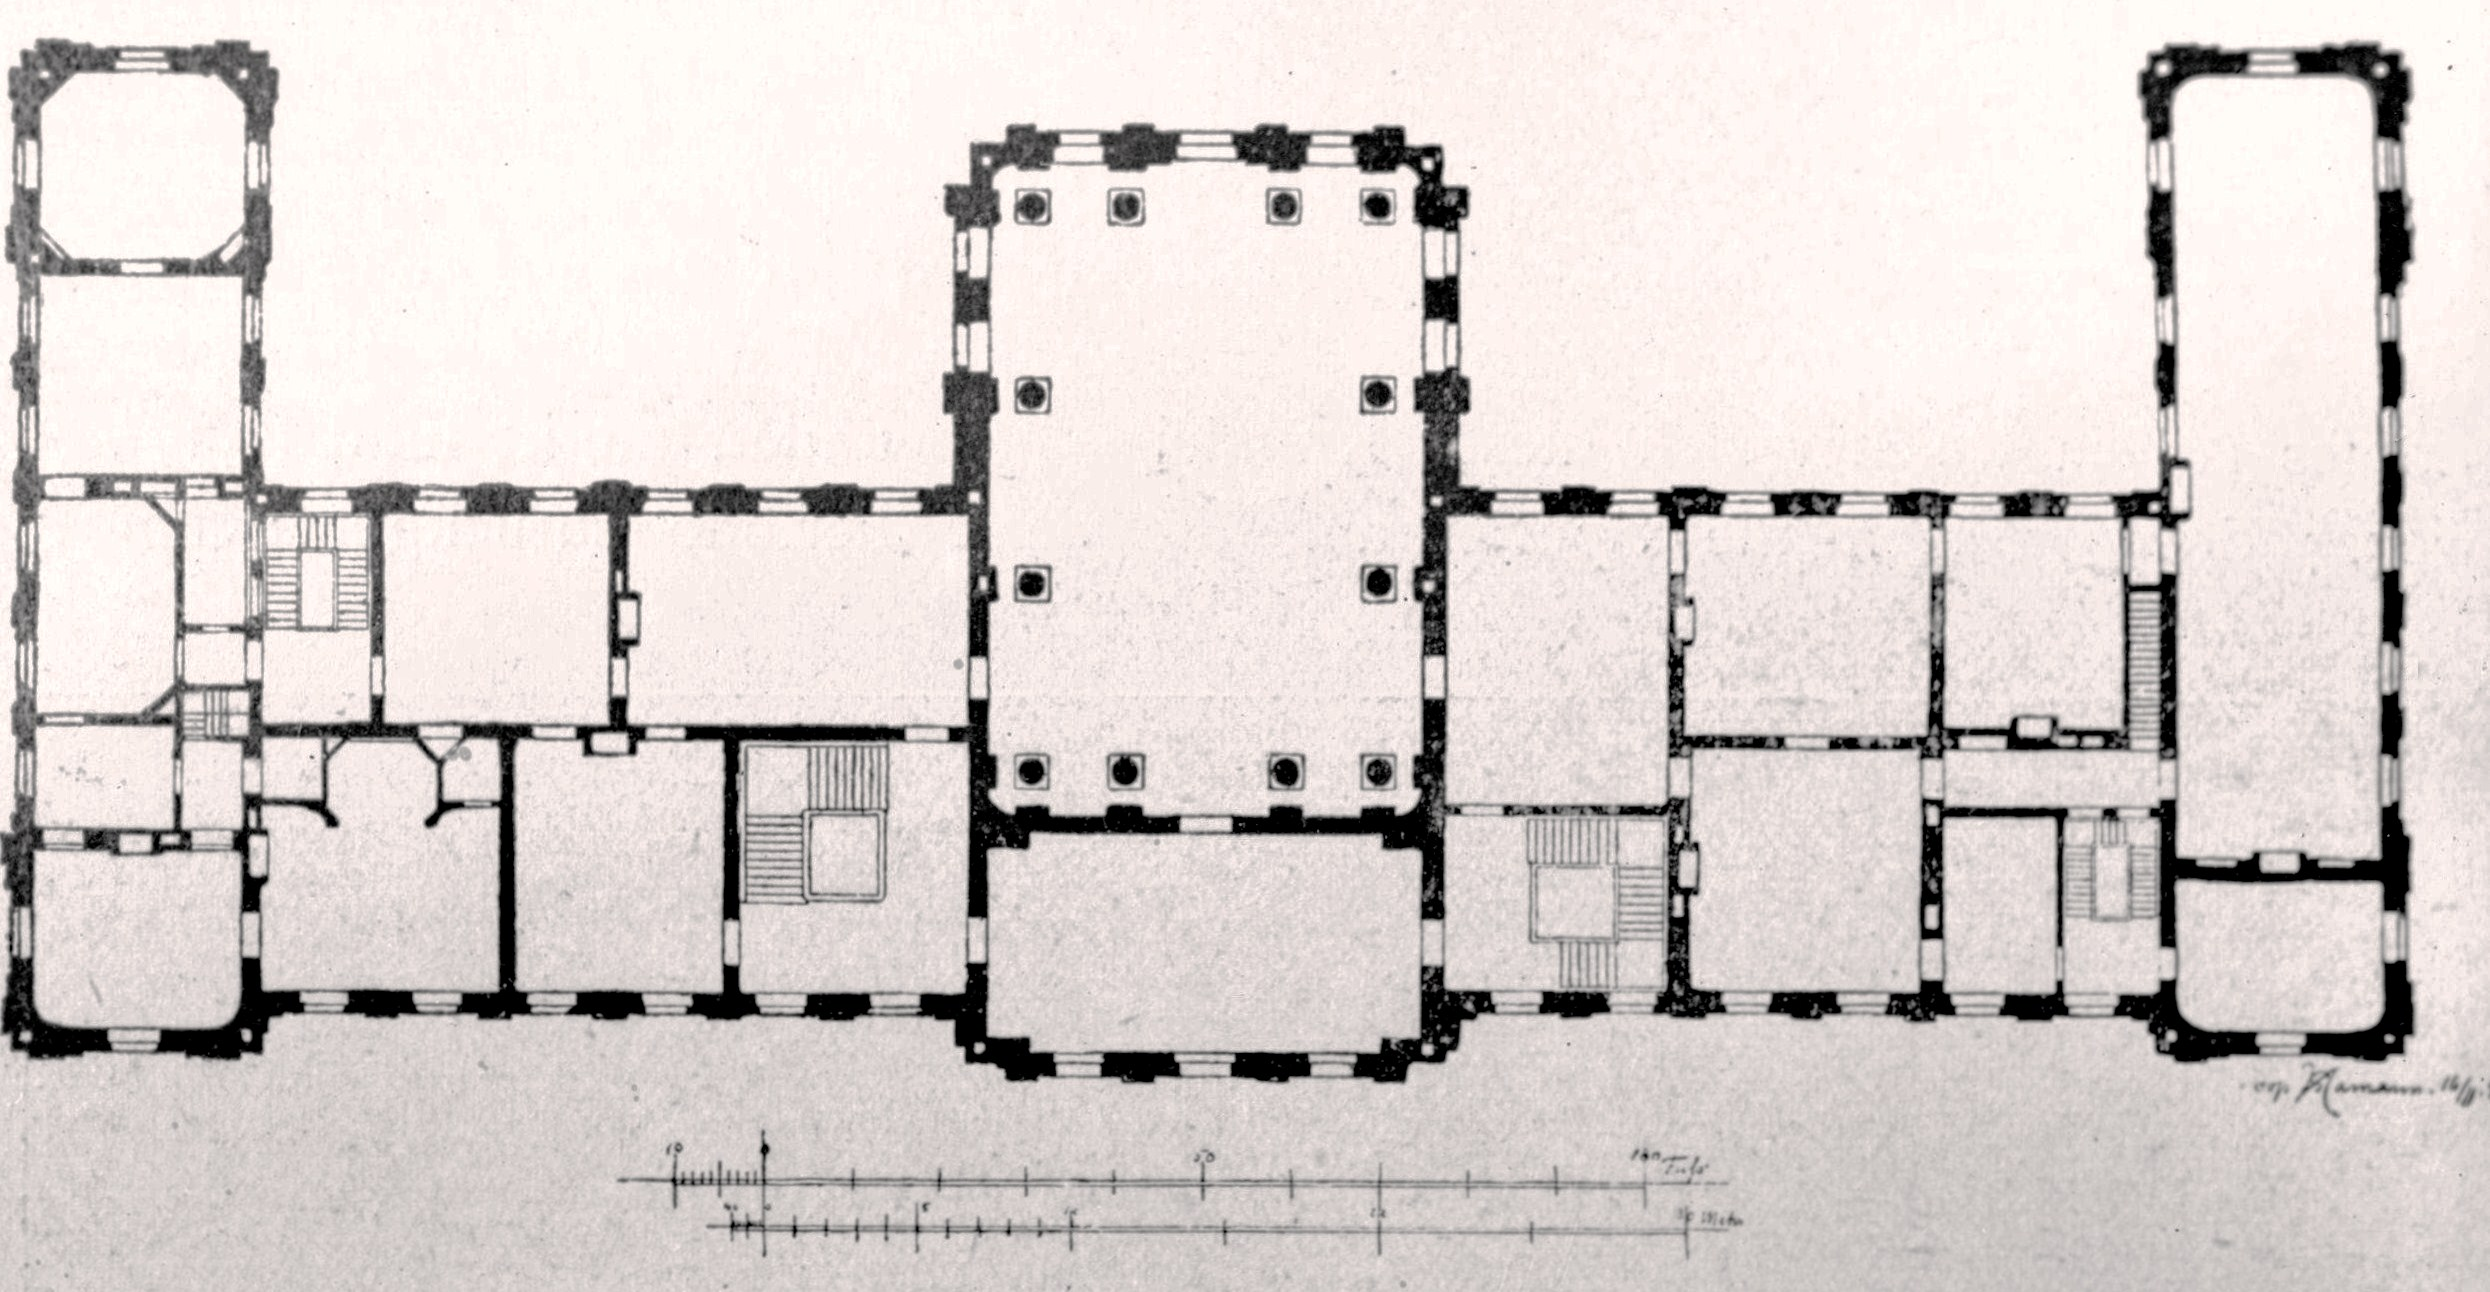 datei llust grundriss wikipedia. Black Bedroom Furniture Sets. Home Design Ideas